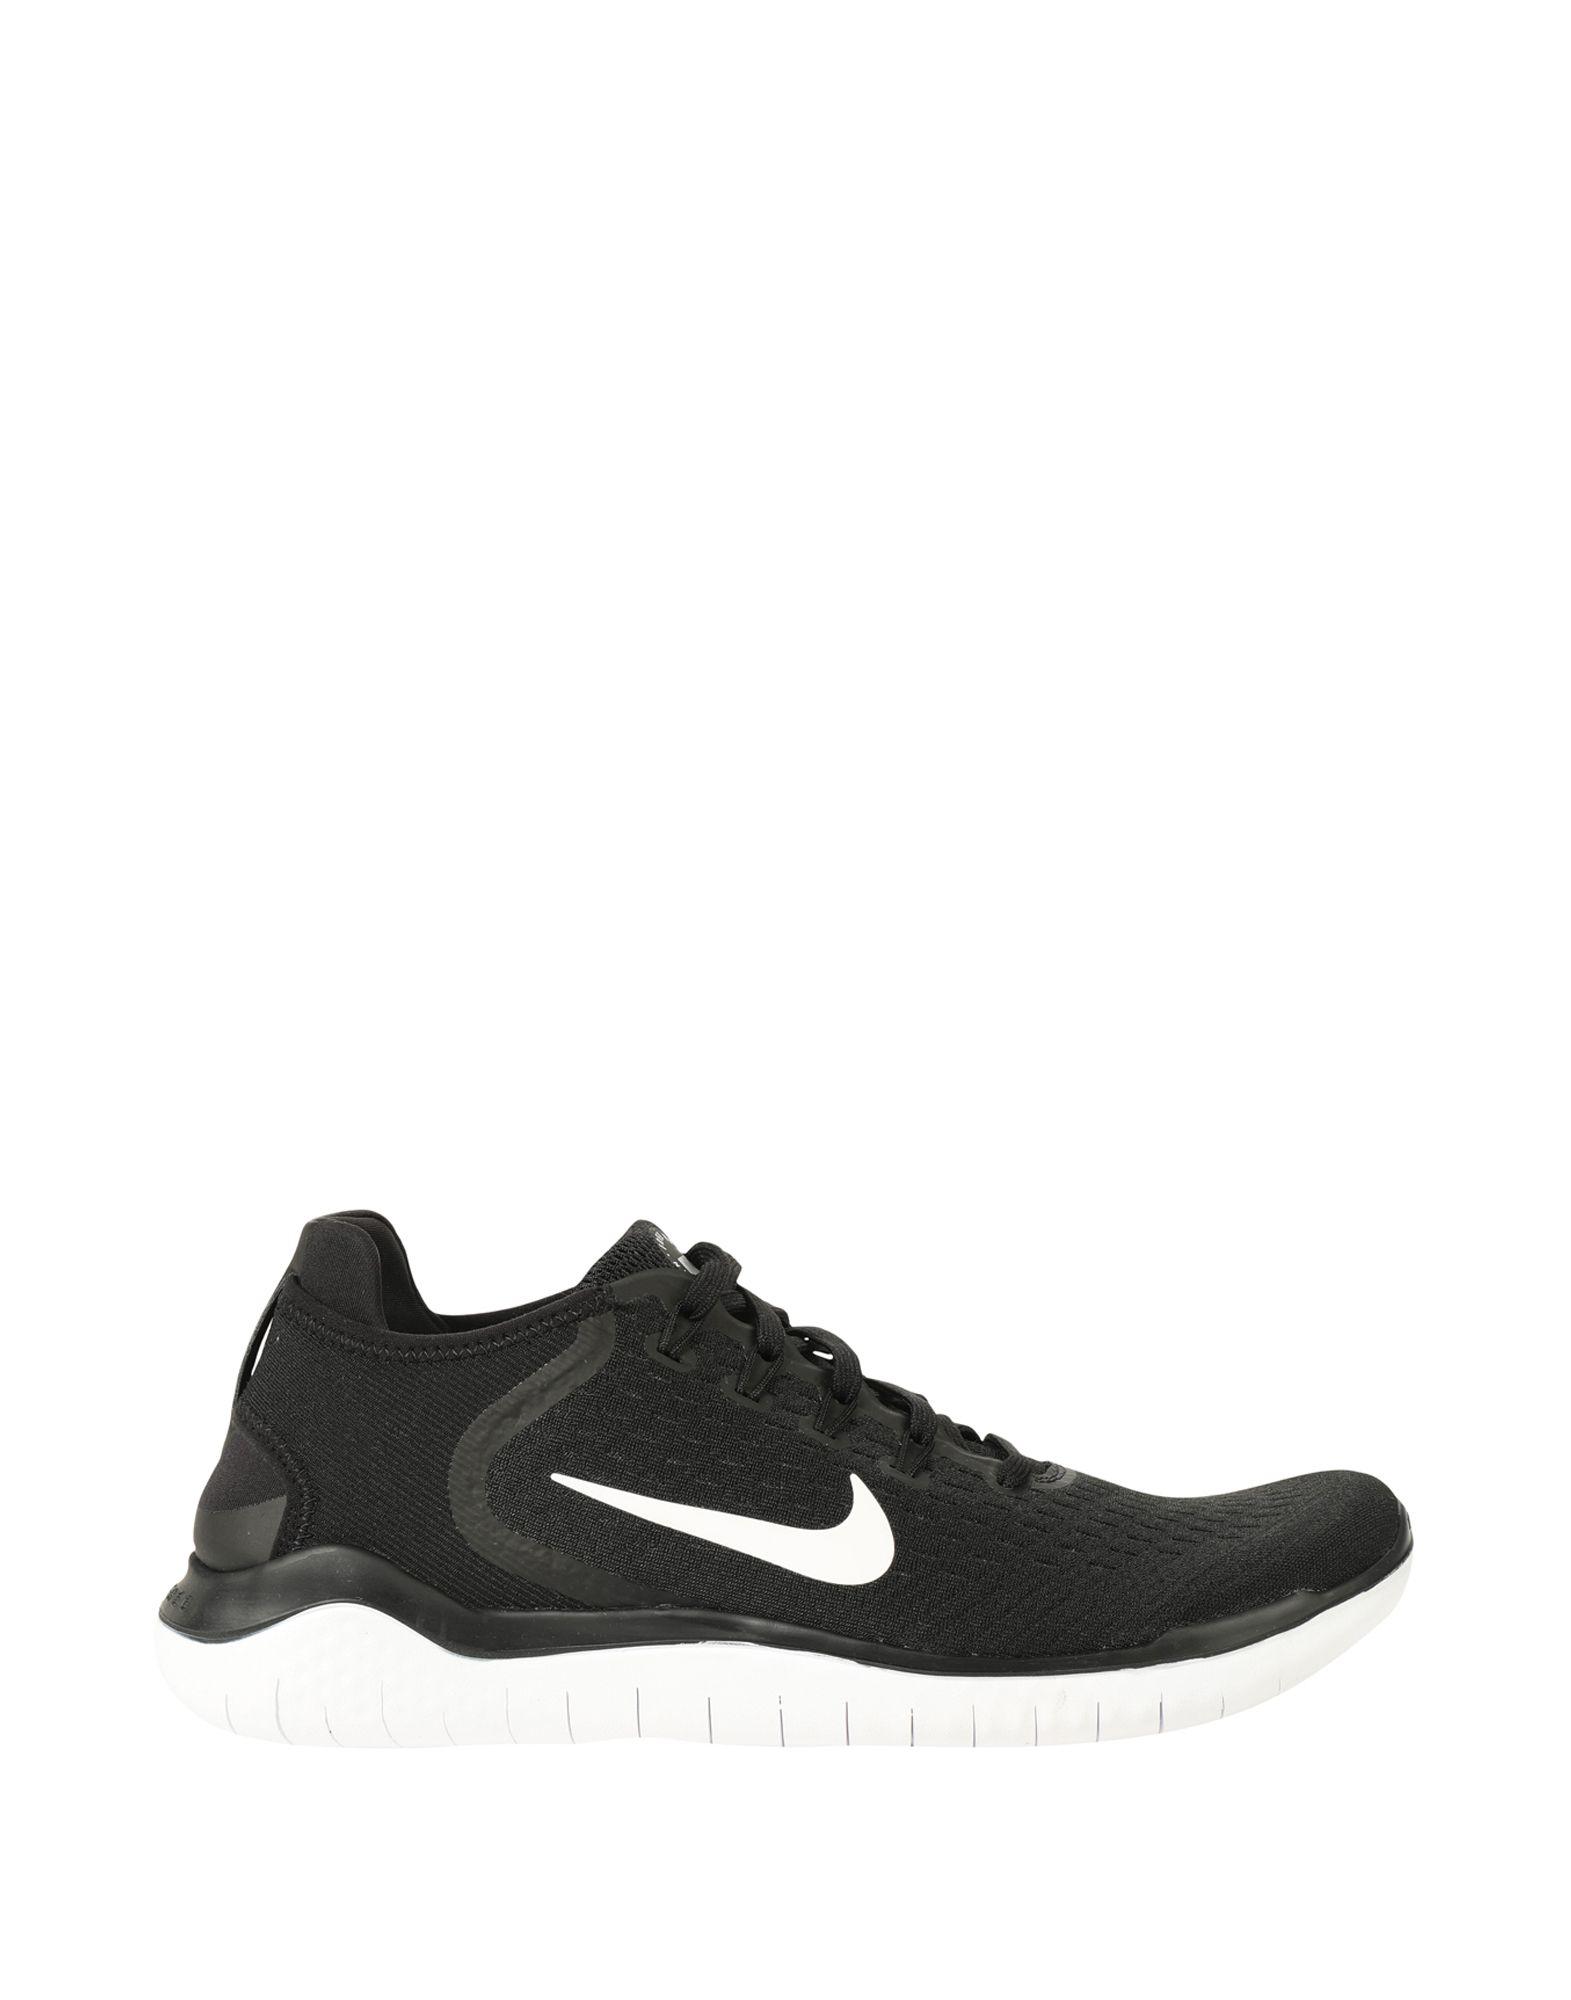 Sneakers Nike  Free Rn 2018 - Uomo - 11540779WT